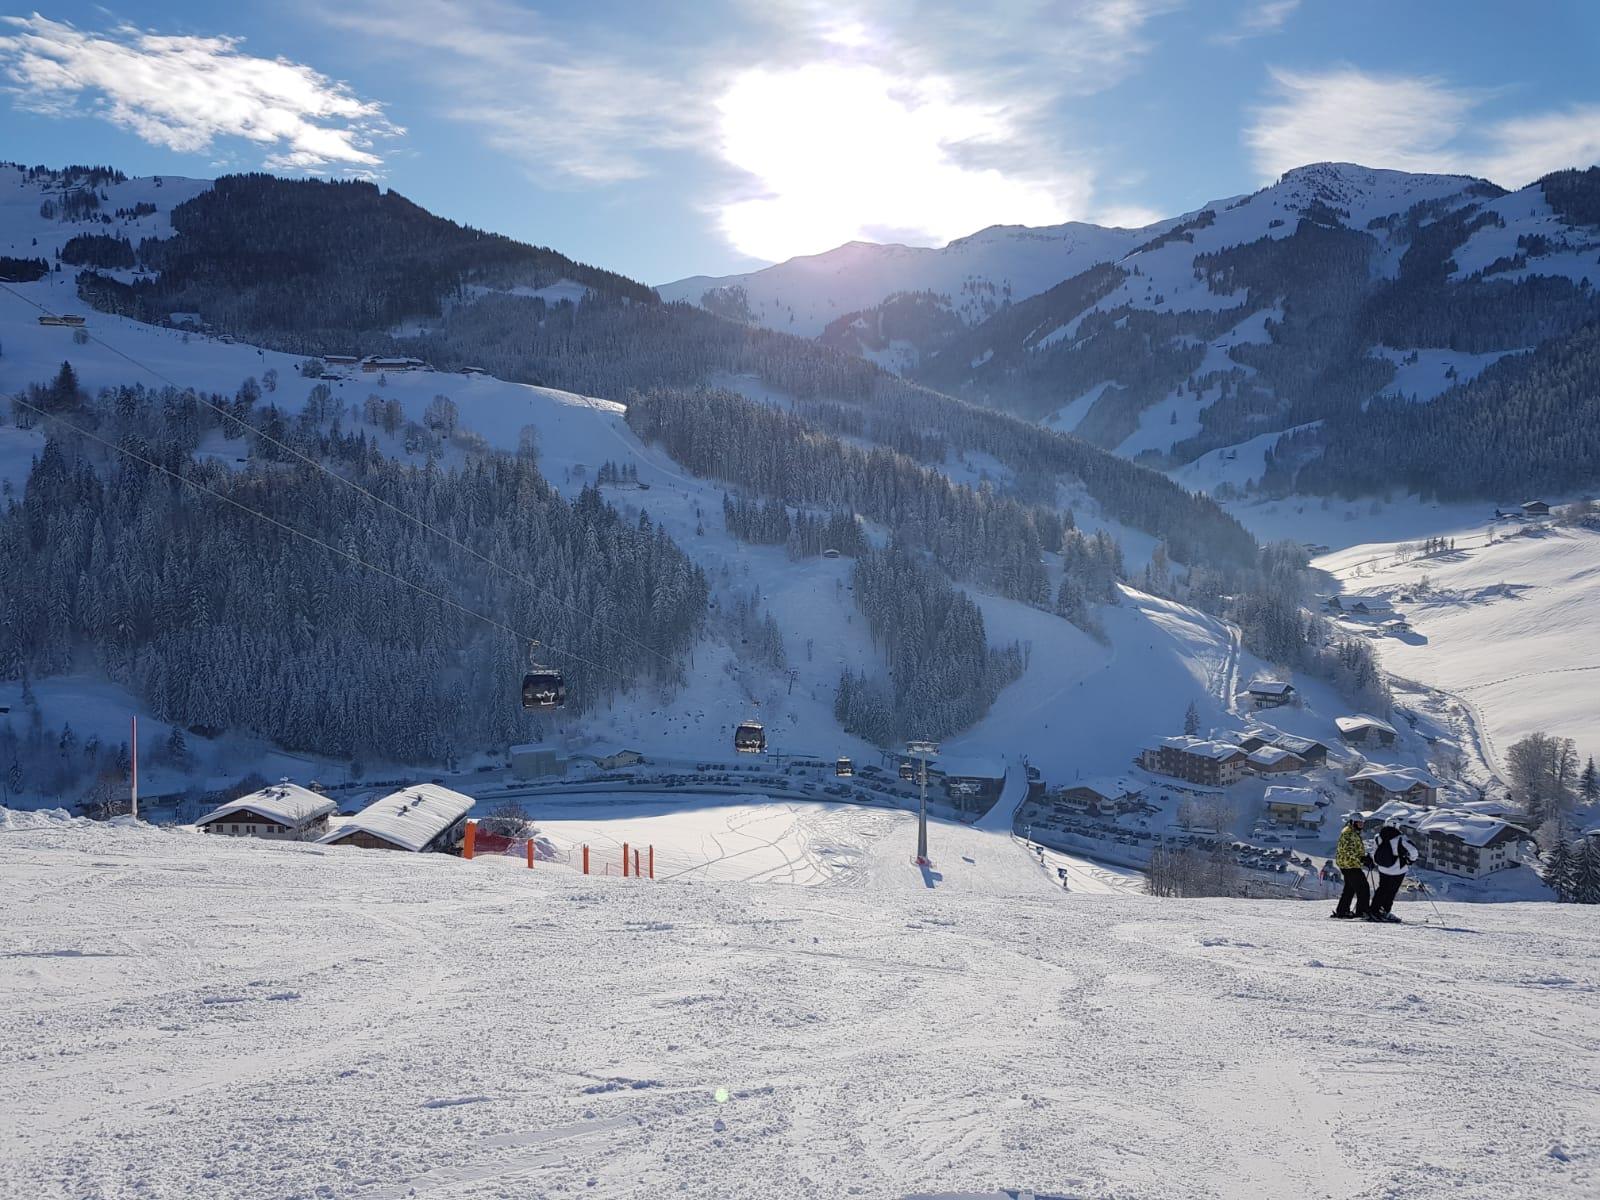 Skischule Edelweiß